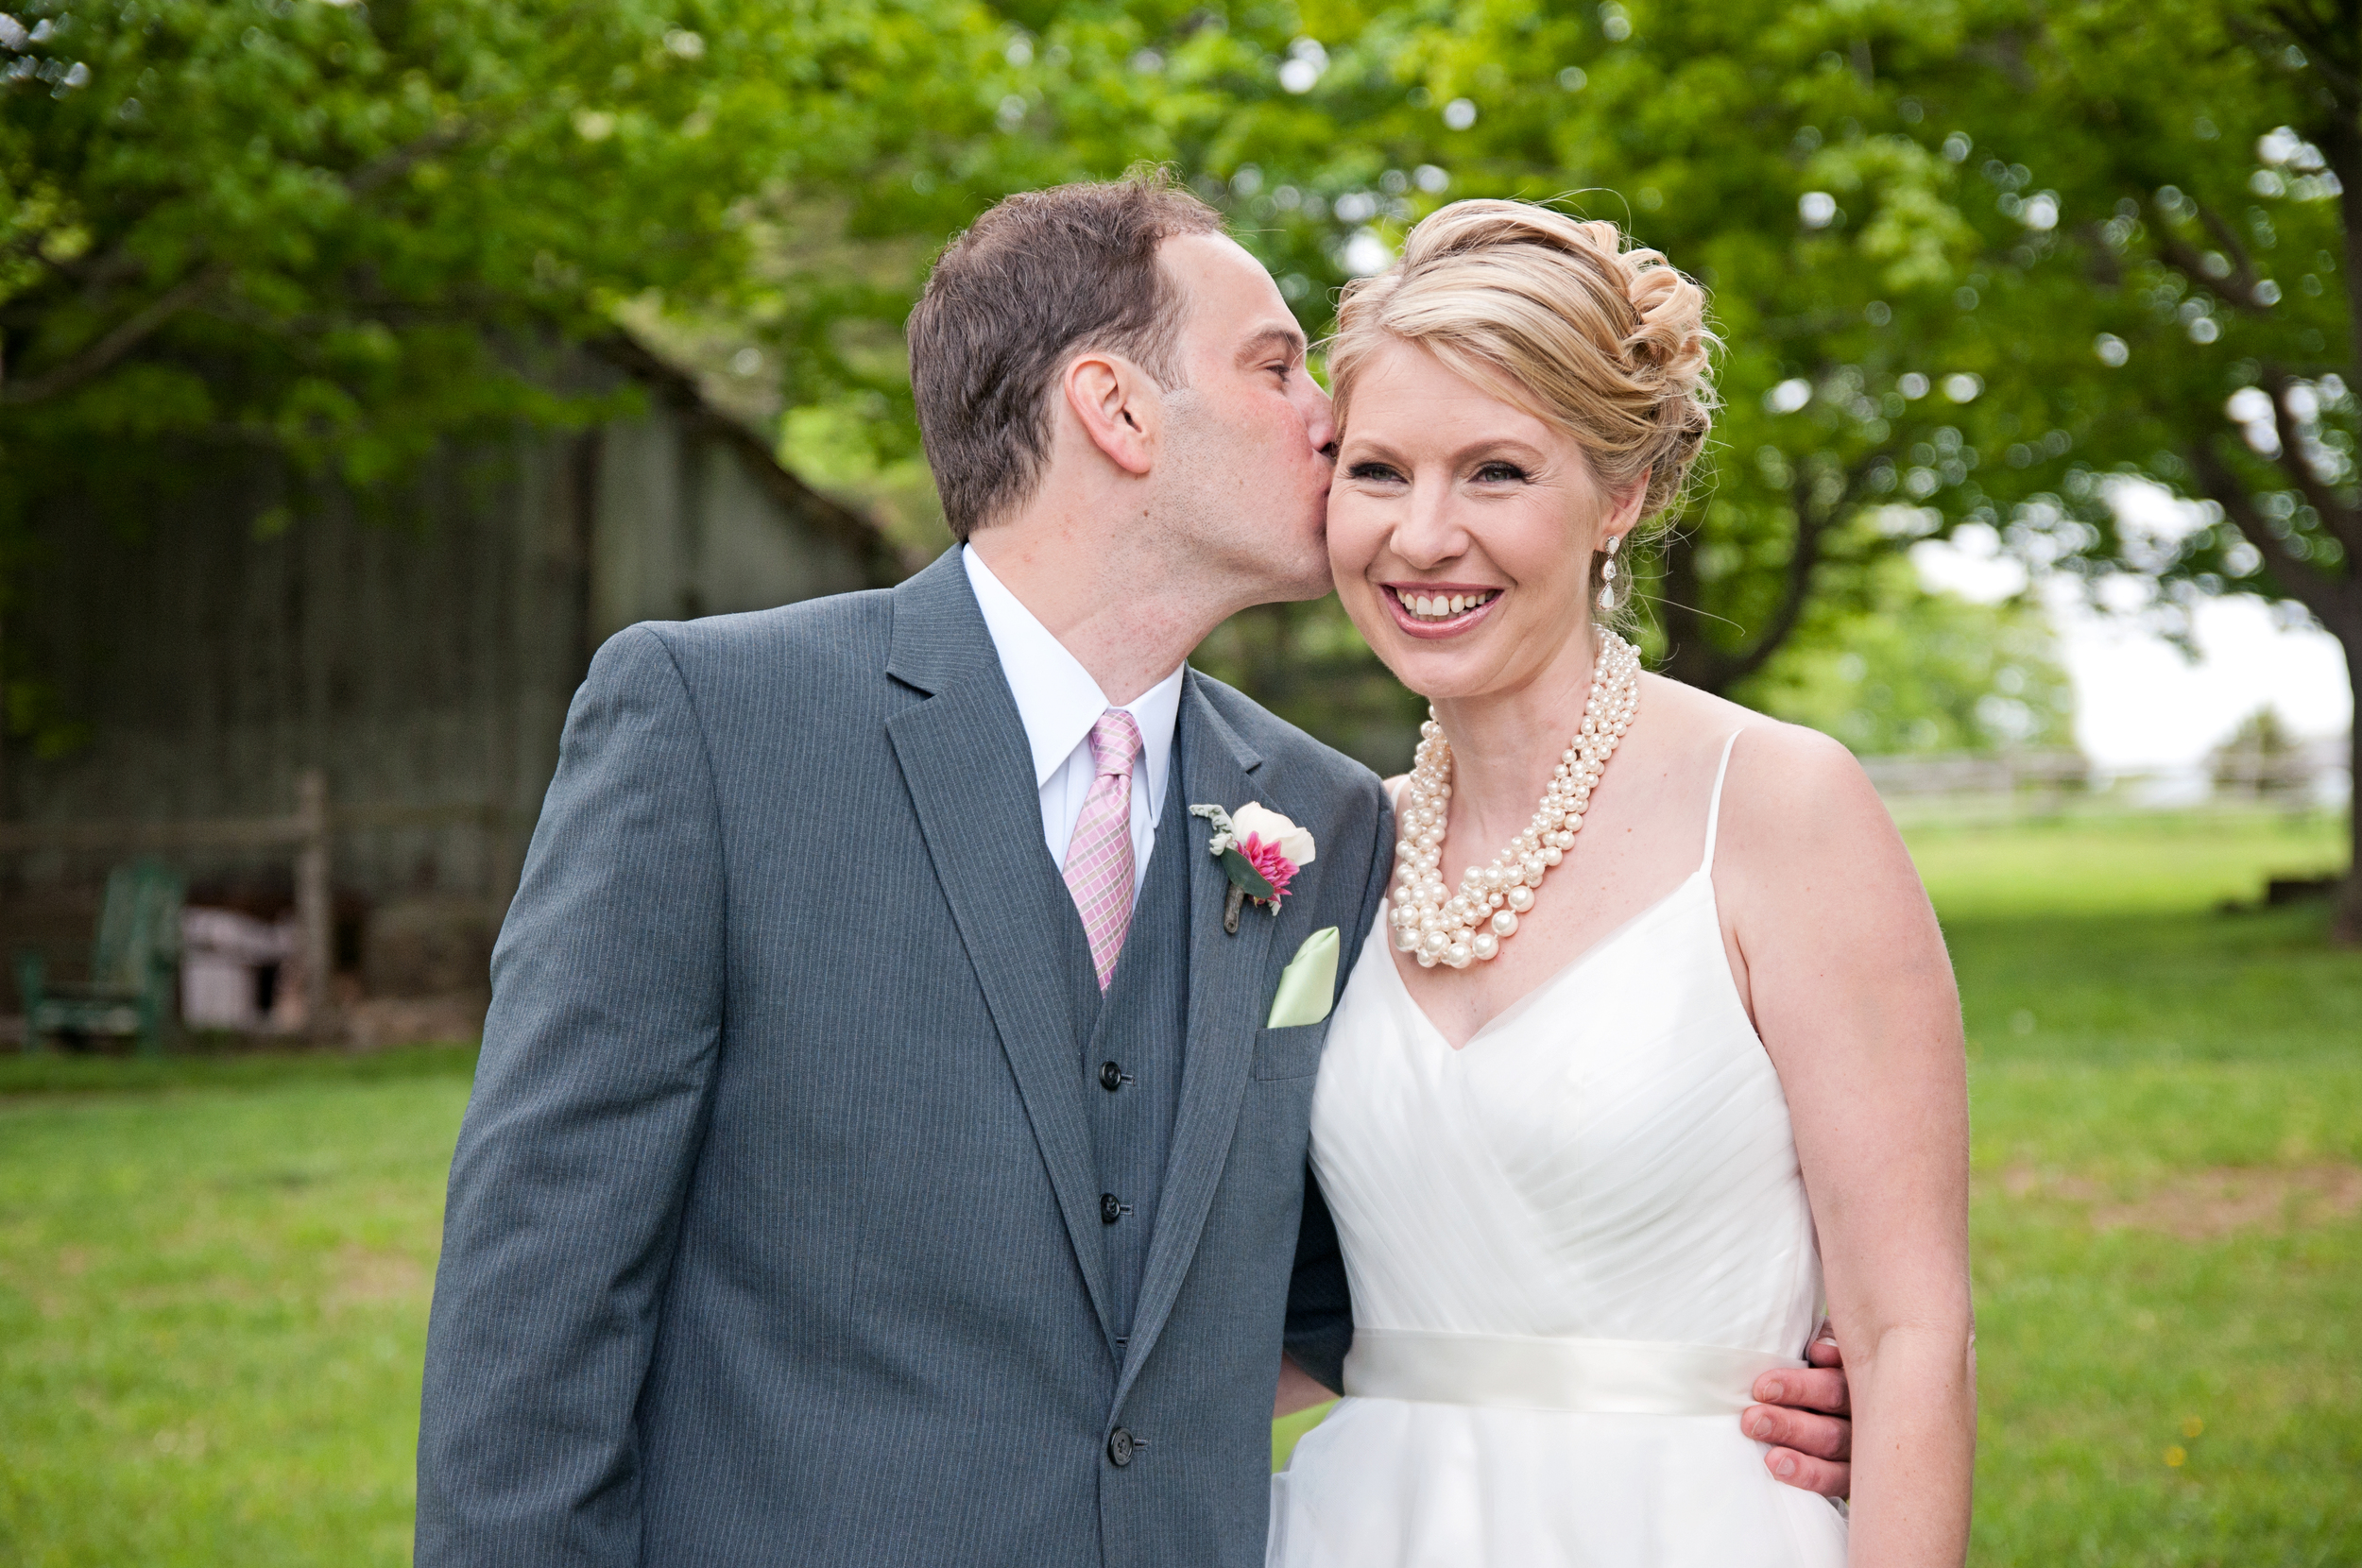 Angela_Chicoski_CT_wedding_photographer_052.jpg